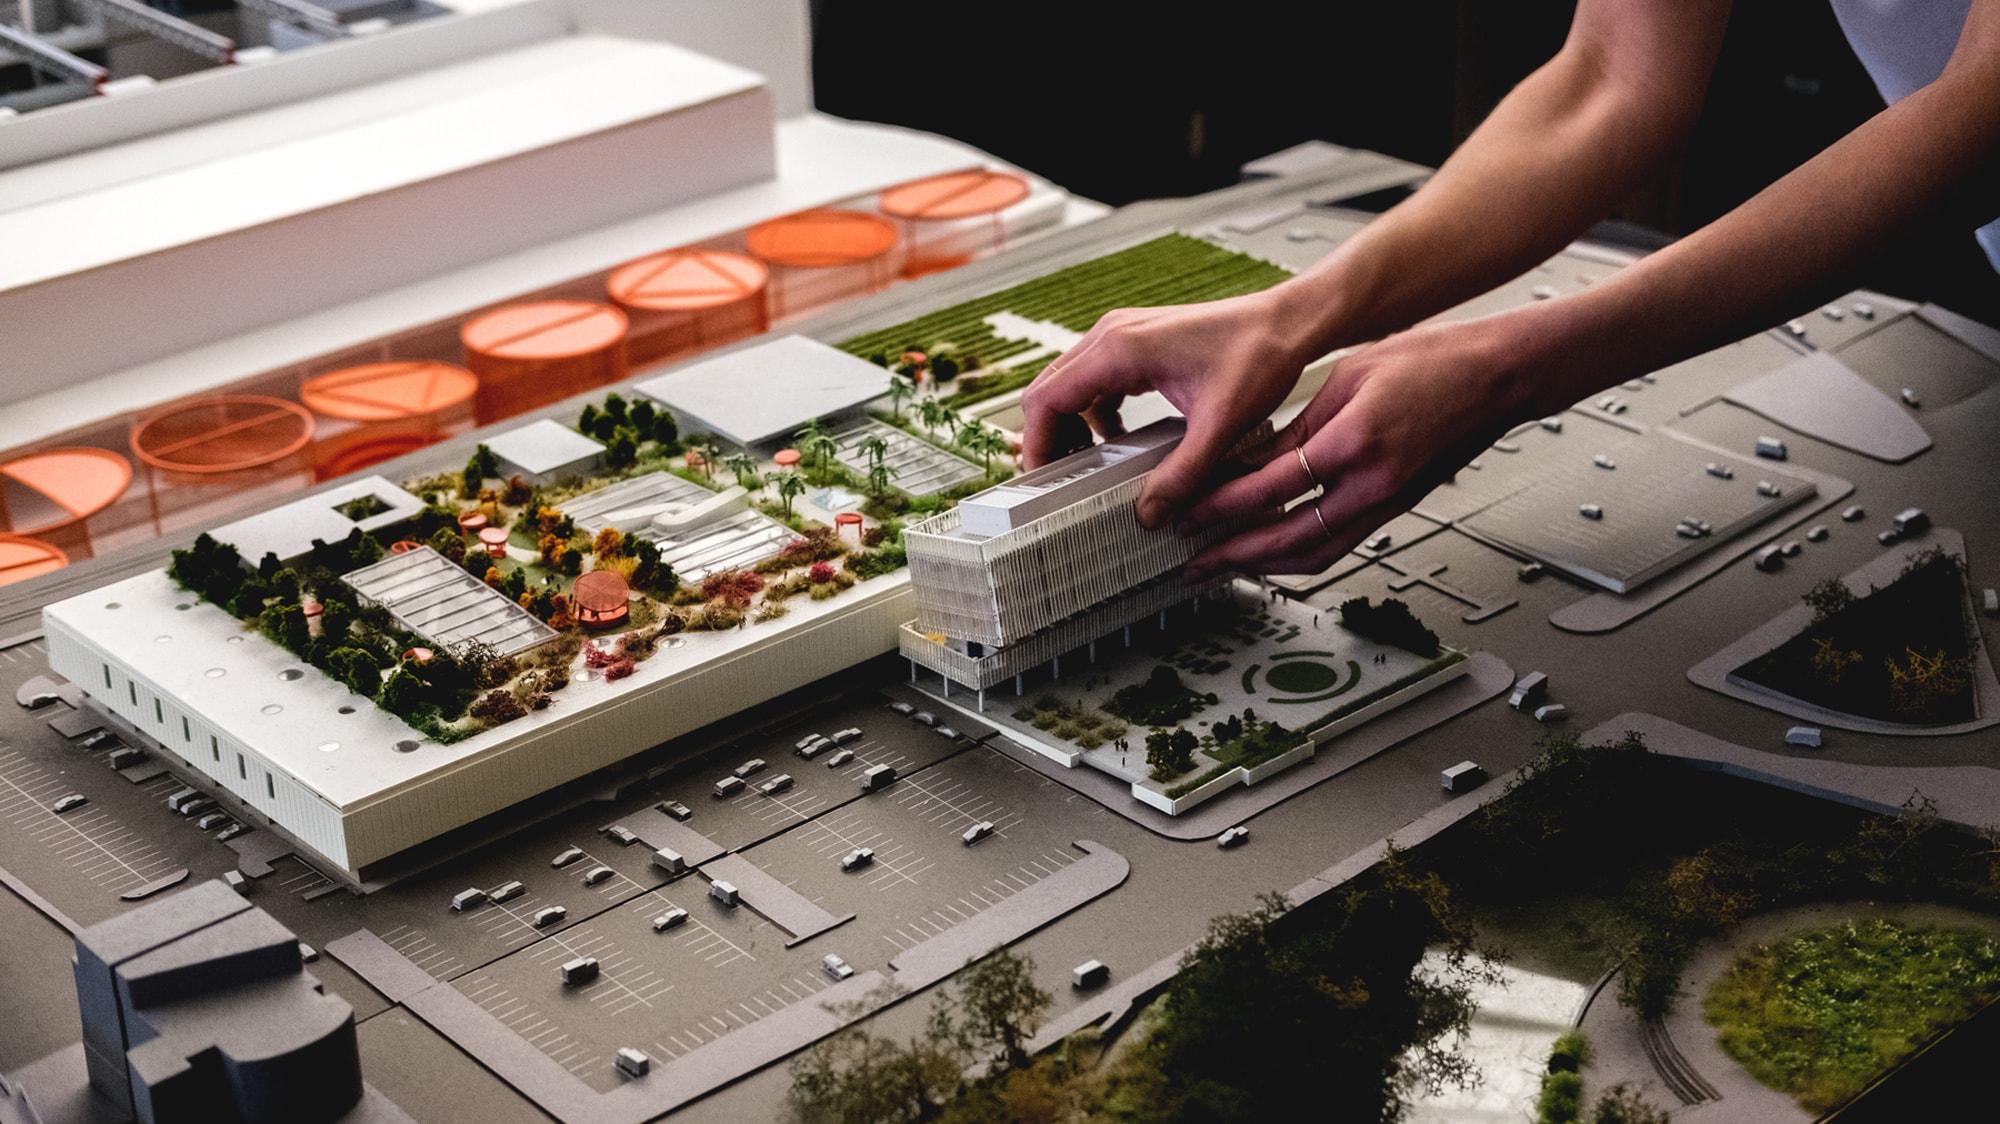 shohei shigematsu oma rem koolhaas prada metropolitan museum of art manus x machina dior exhibition lexus design award architecture architect design new york city japan